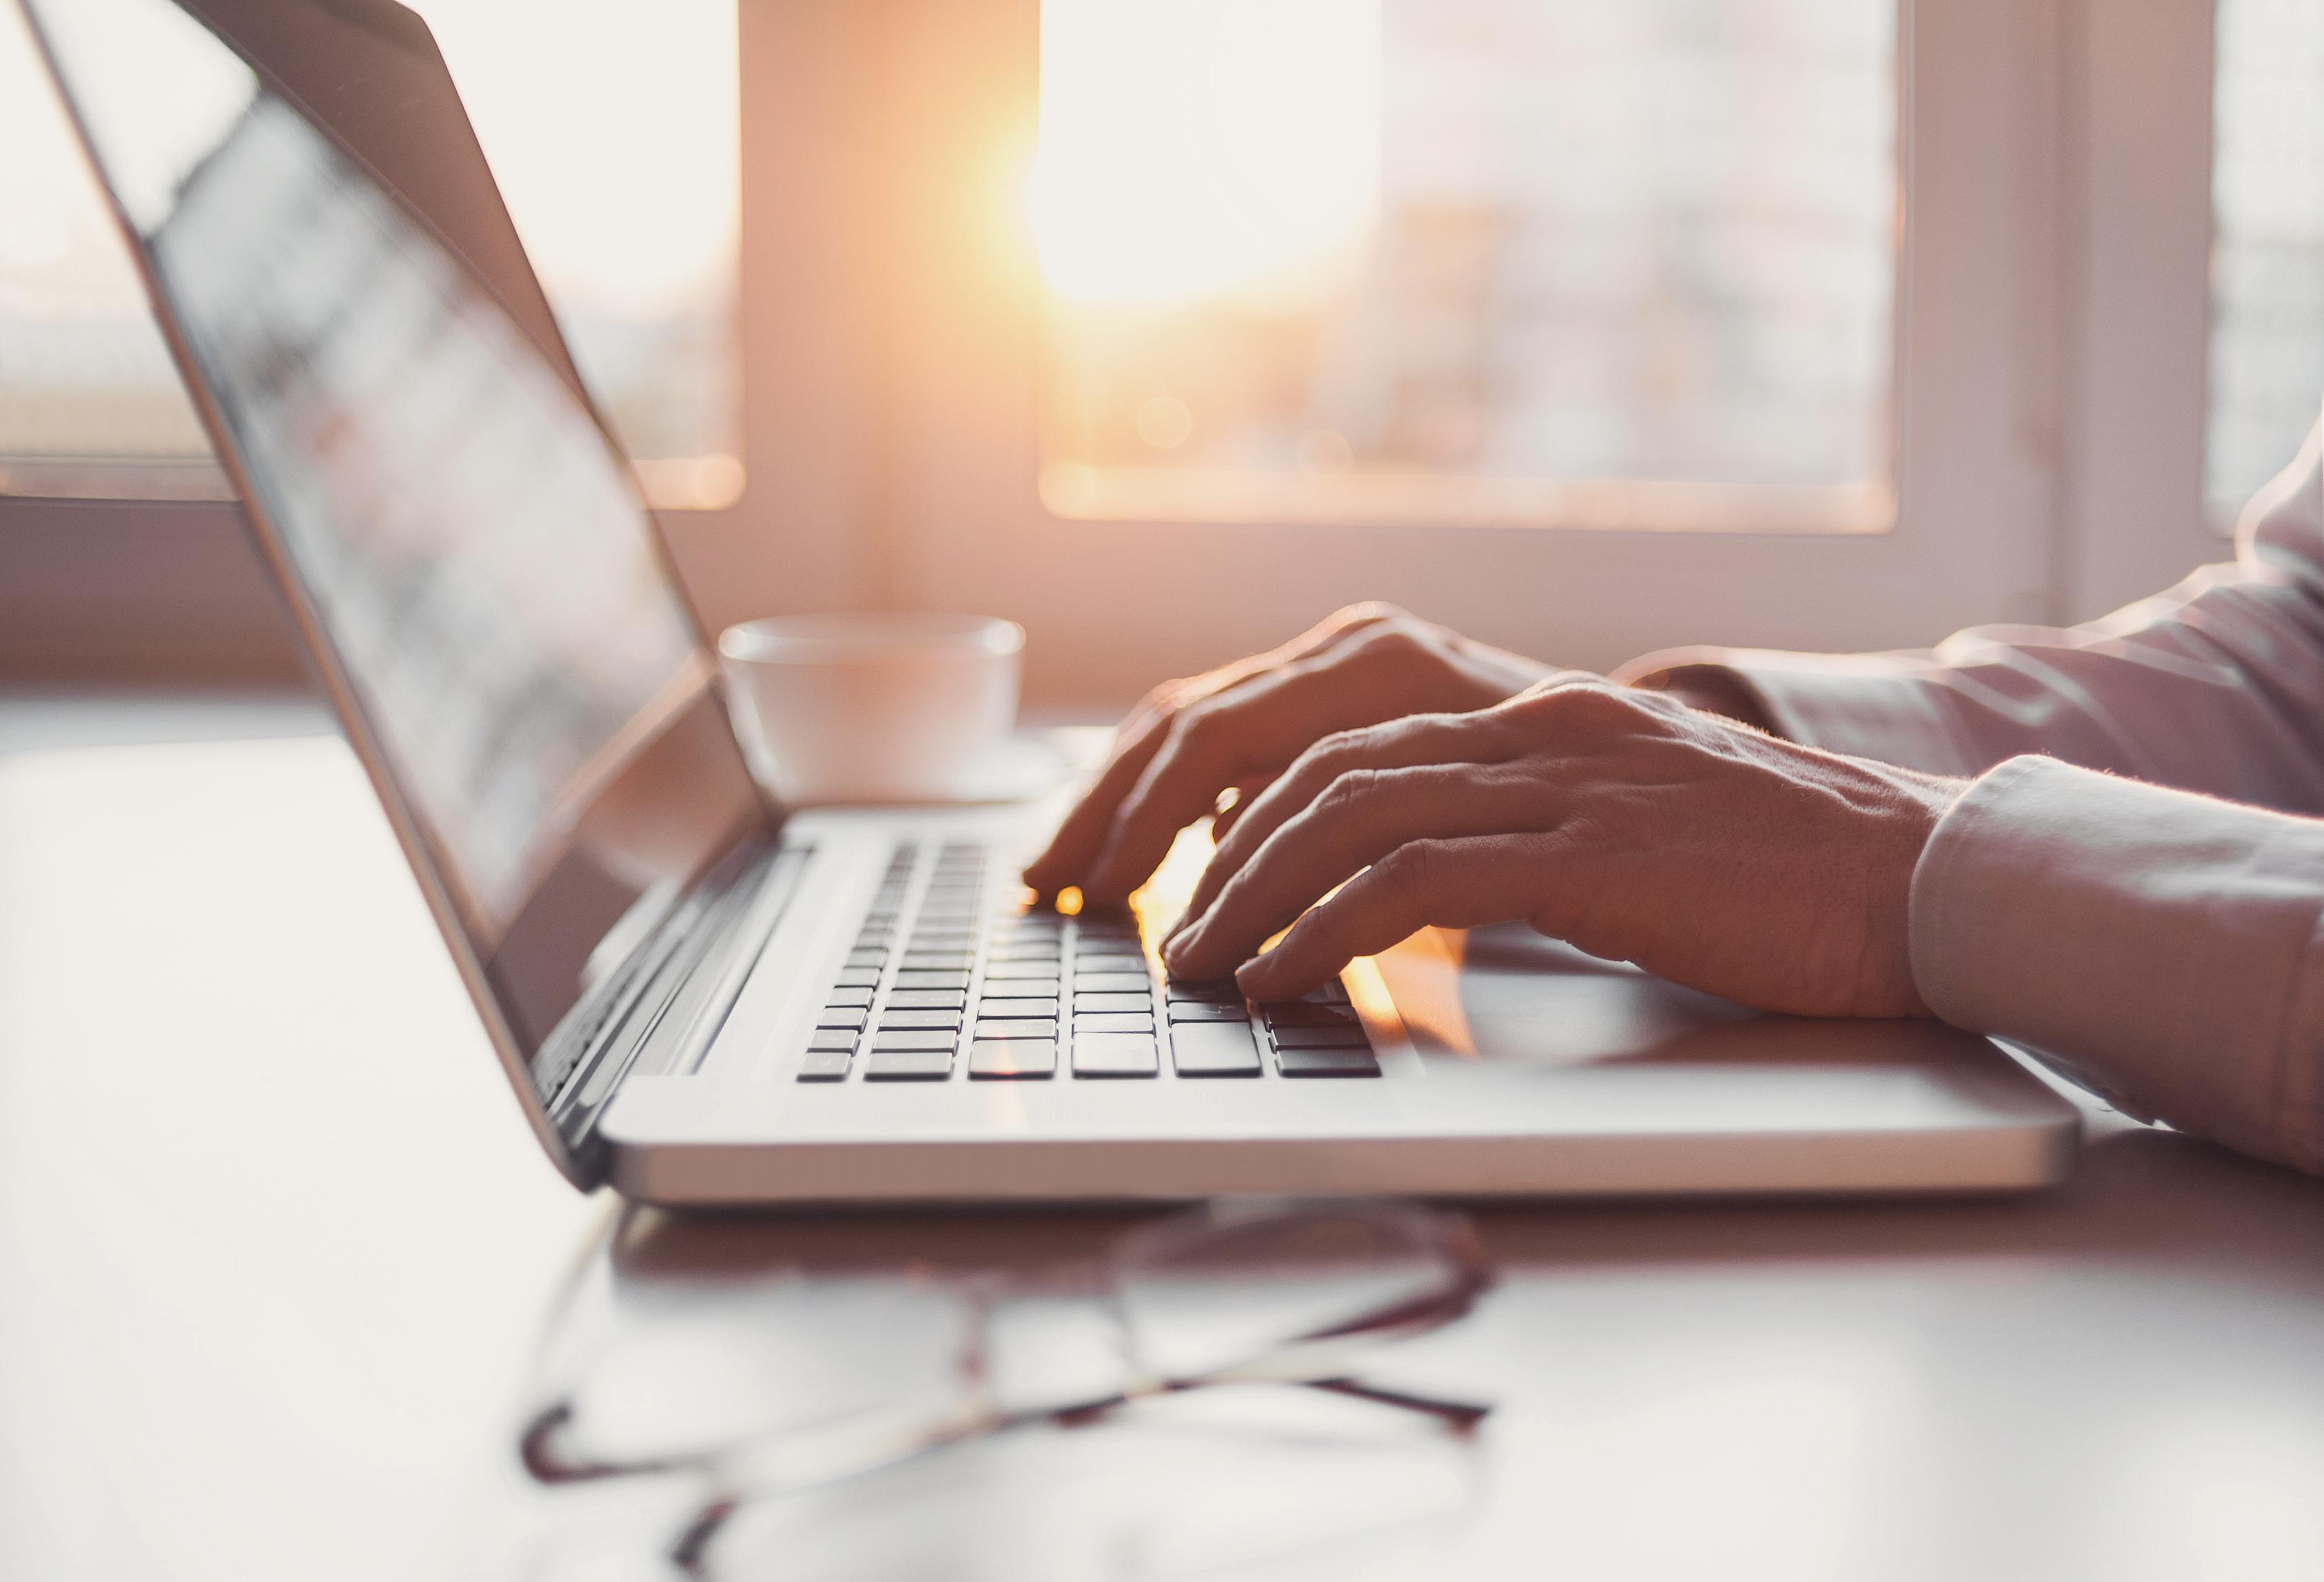 Man using a laptop computer